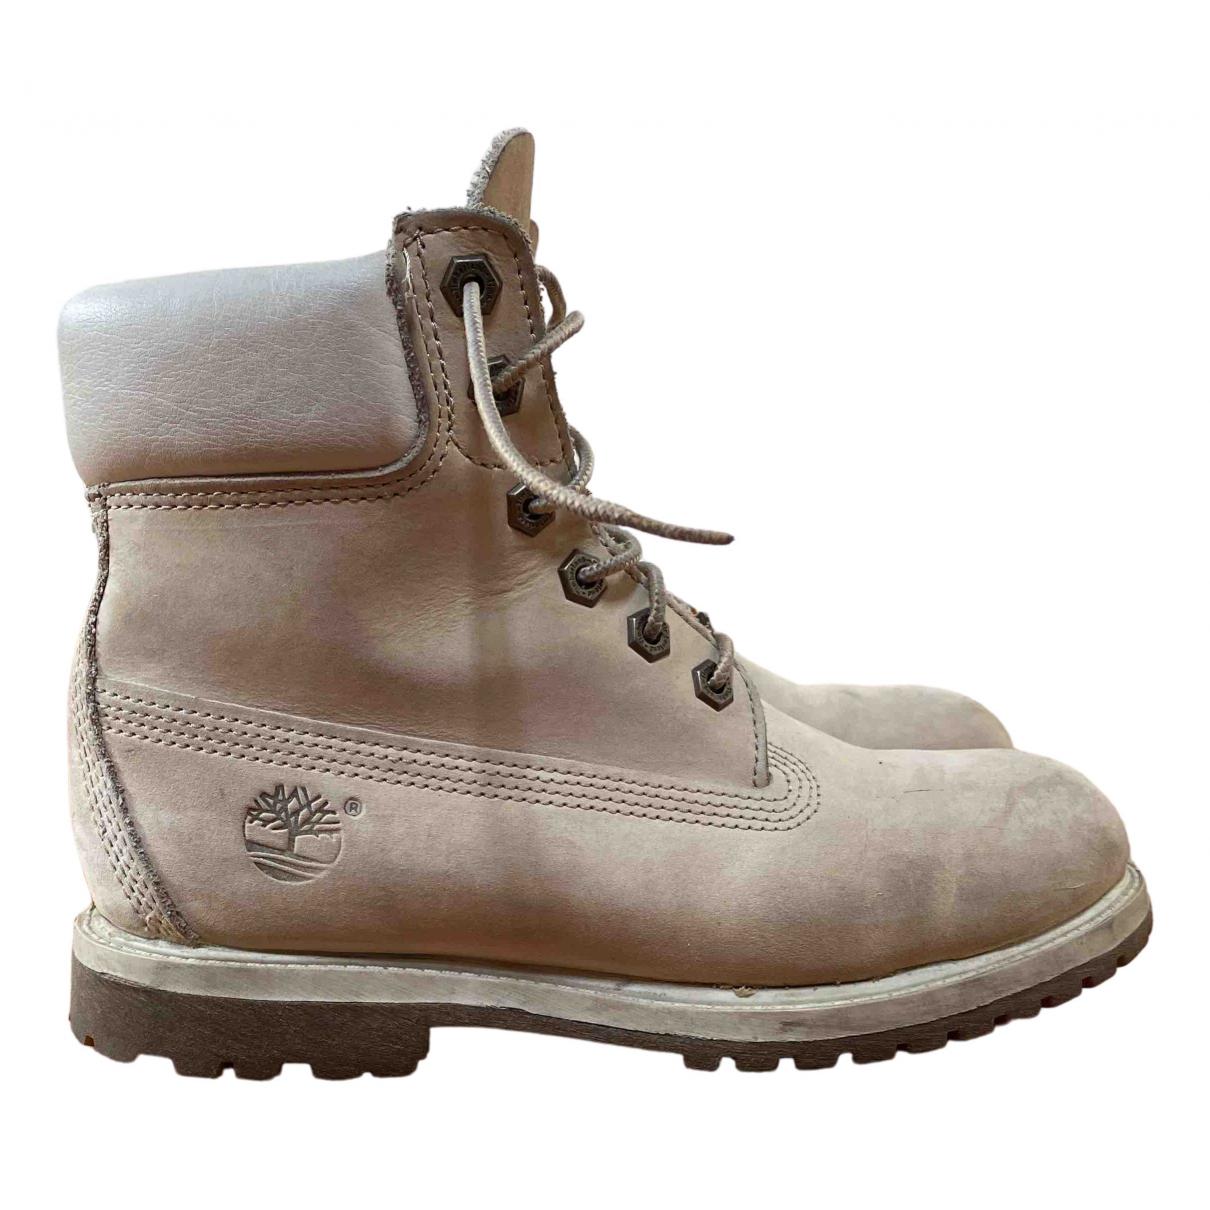 Timberland - Boots   pour femme en cuir - blanc